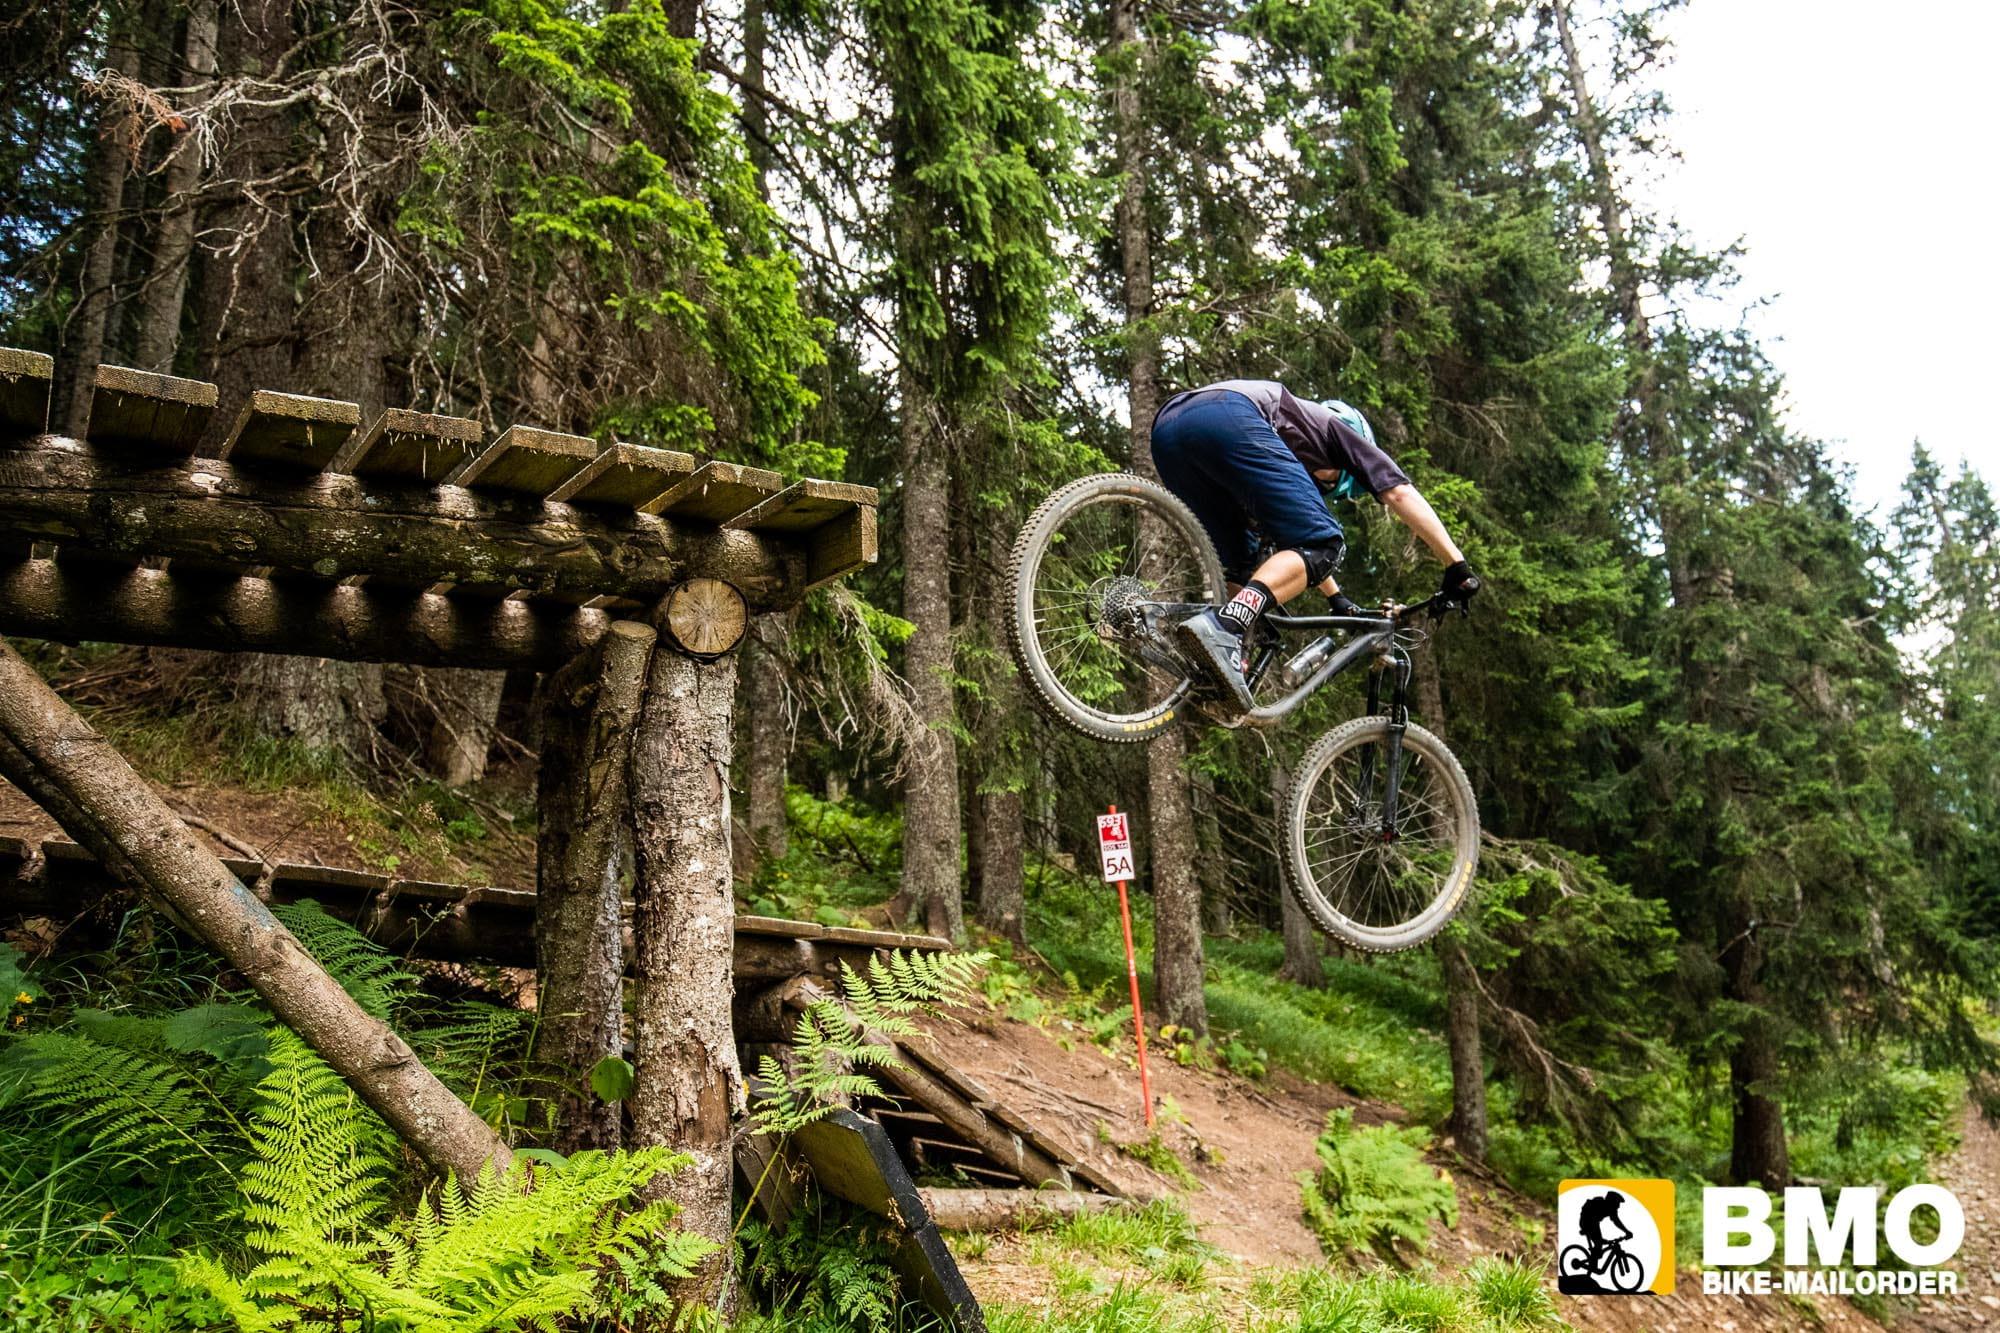 BMO-Bike-Mailorder-Lenzerheide-Home-of-Trails-6